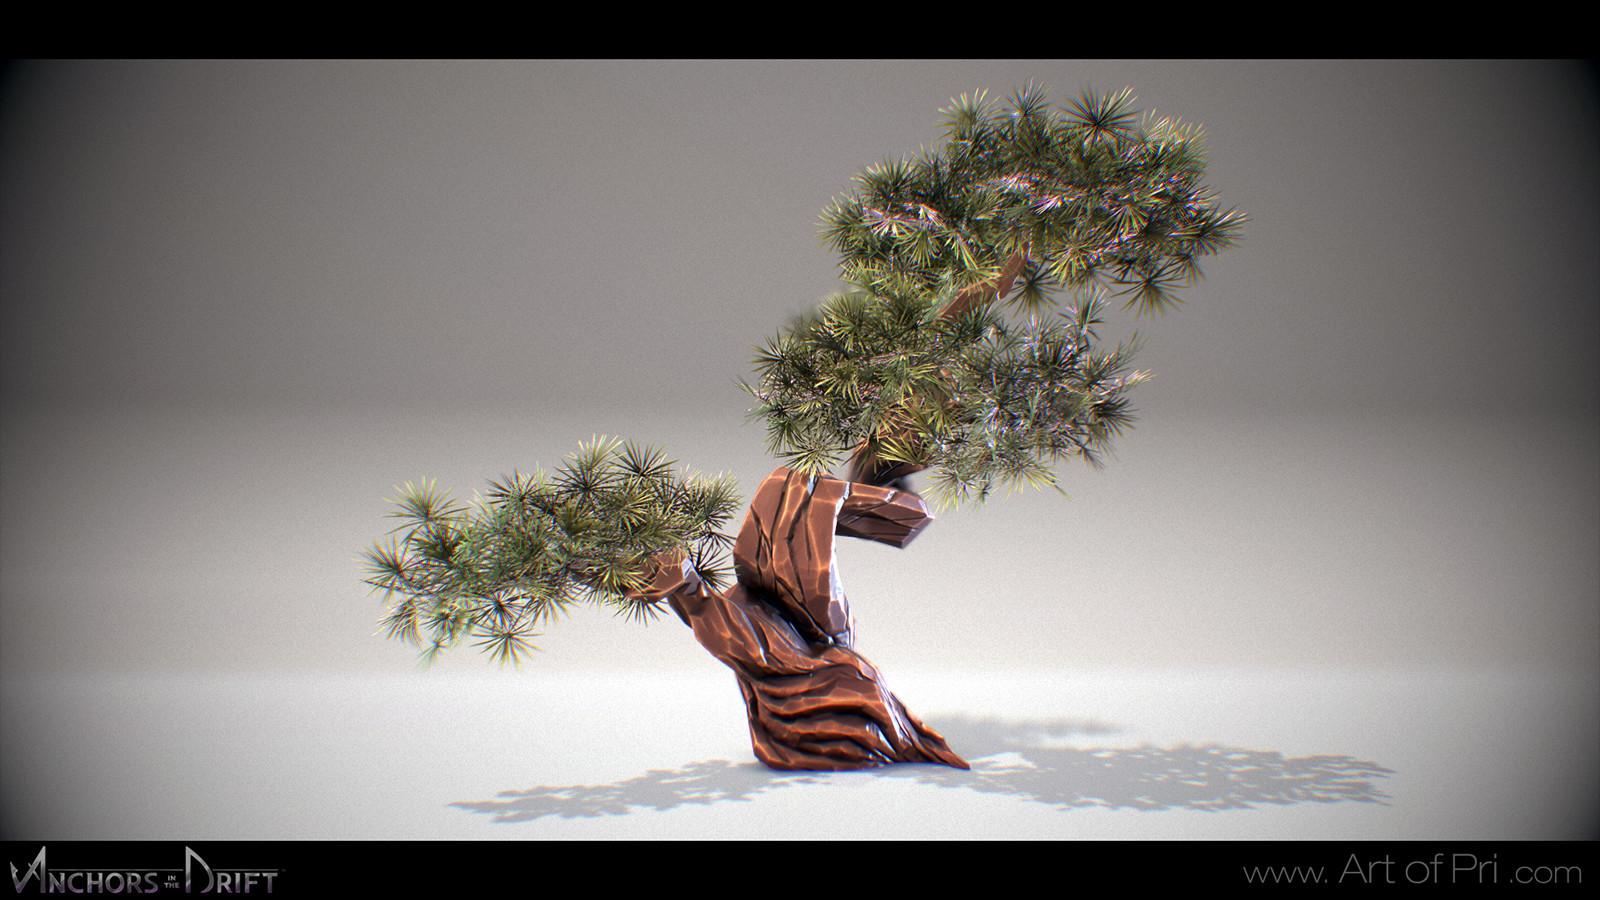 Priscilla firstenberg priscilla firstenberg bonsai03